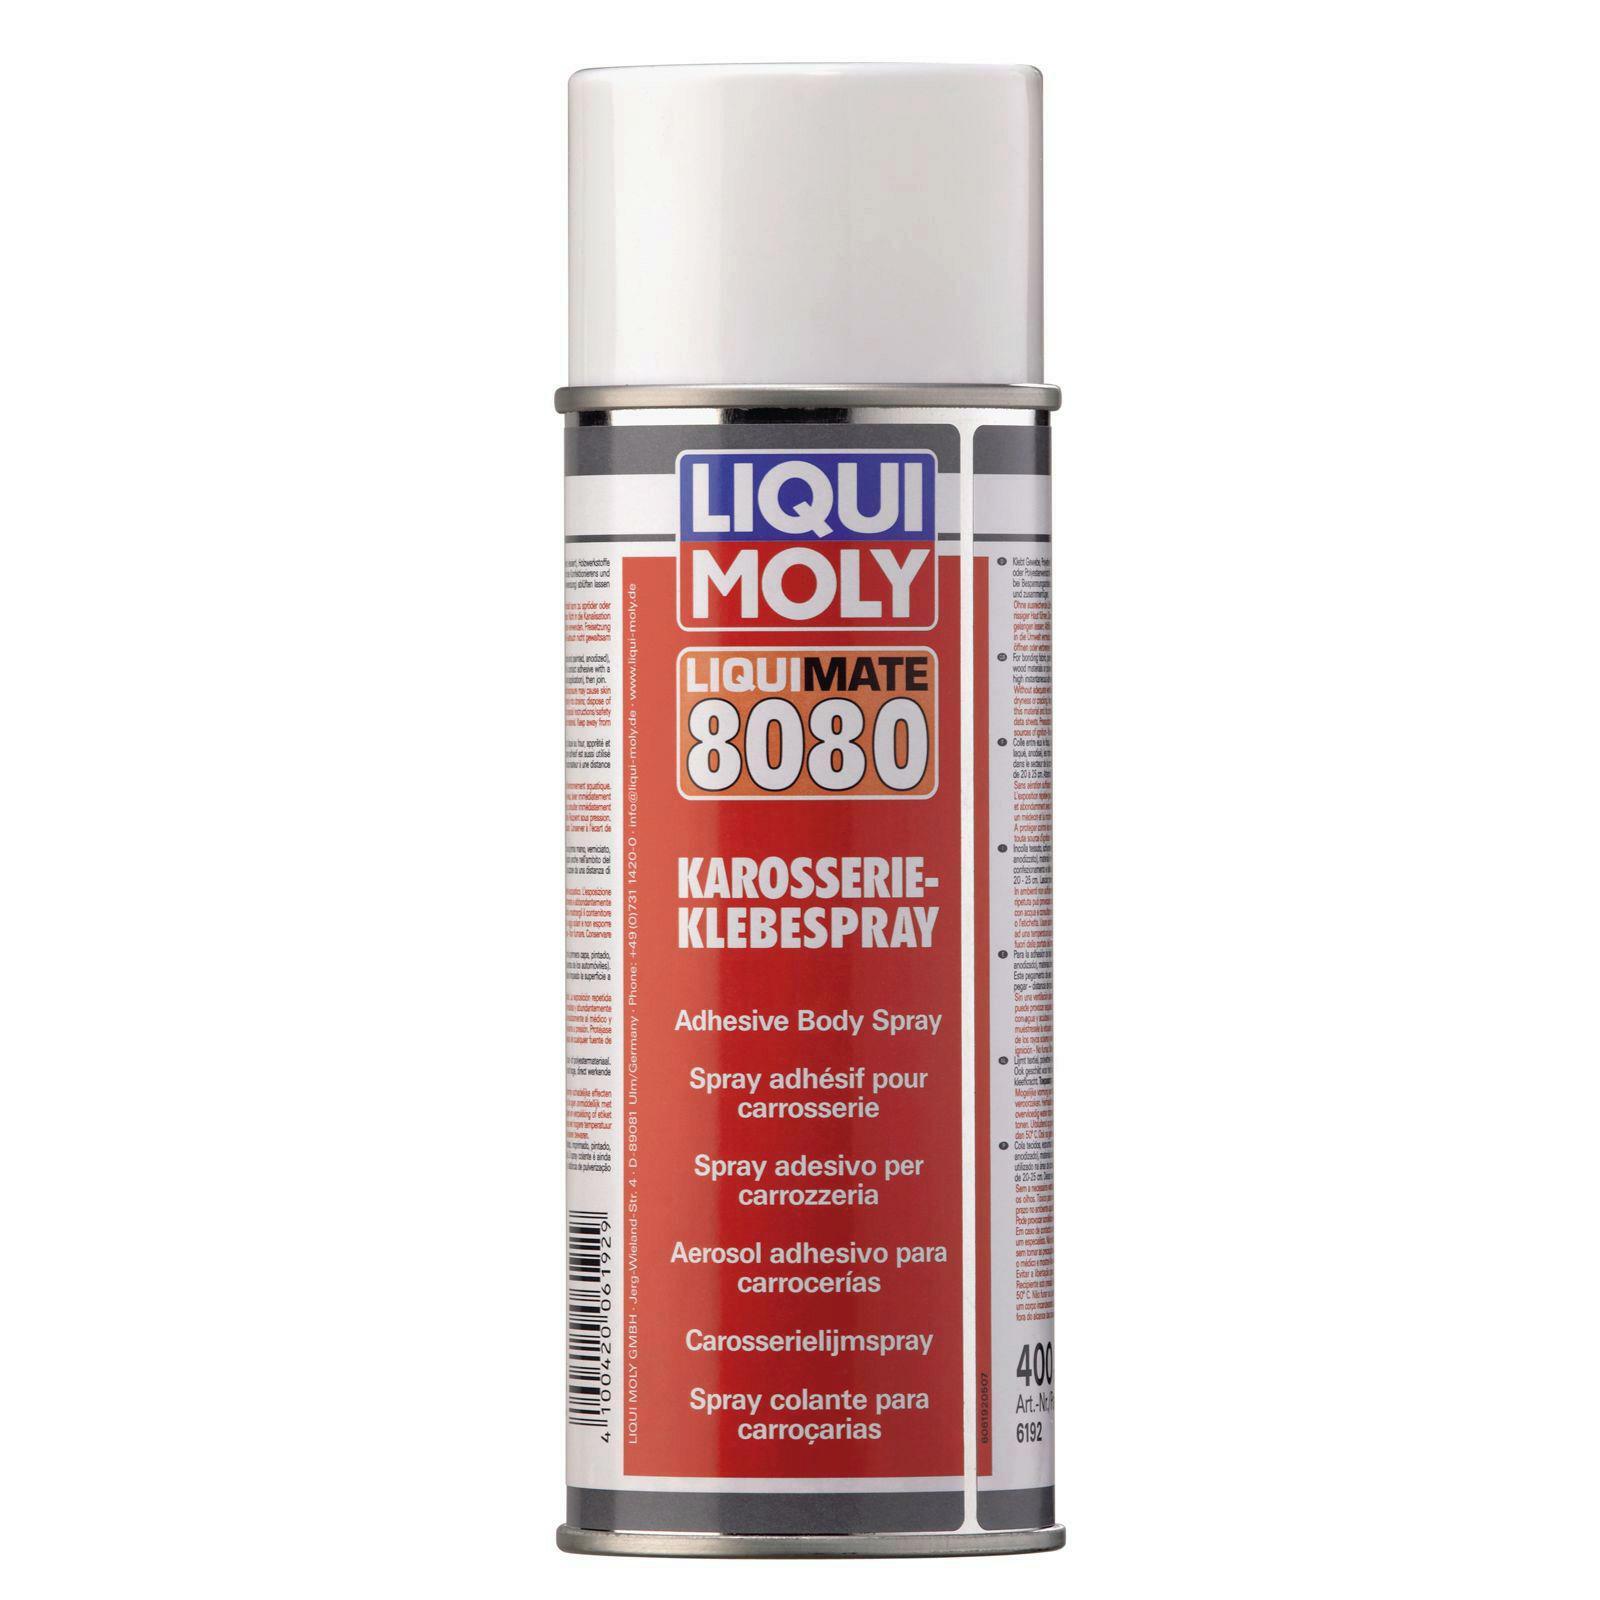 Liqui Moly Karosserie-Klebespray 400ml